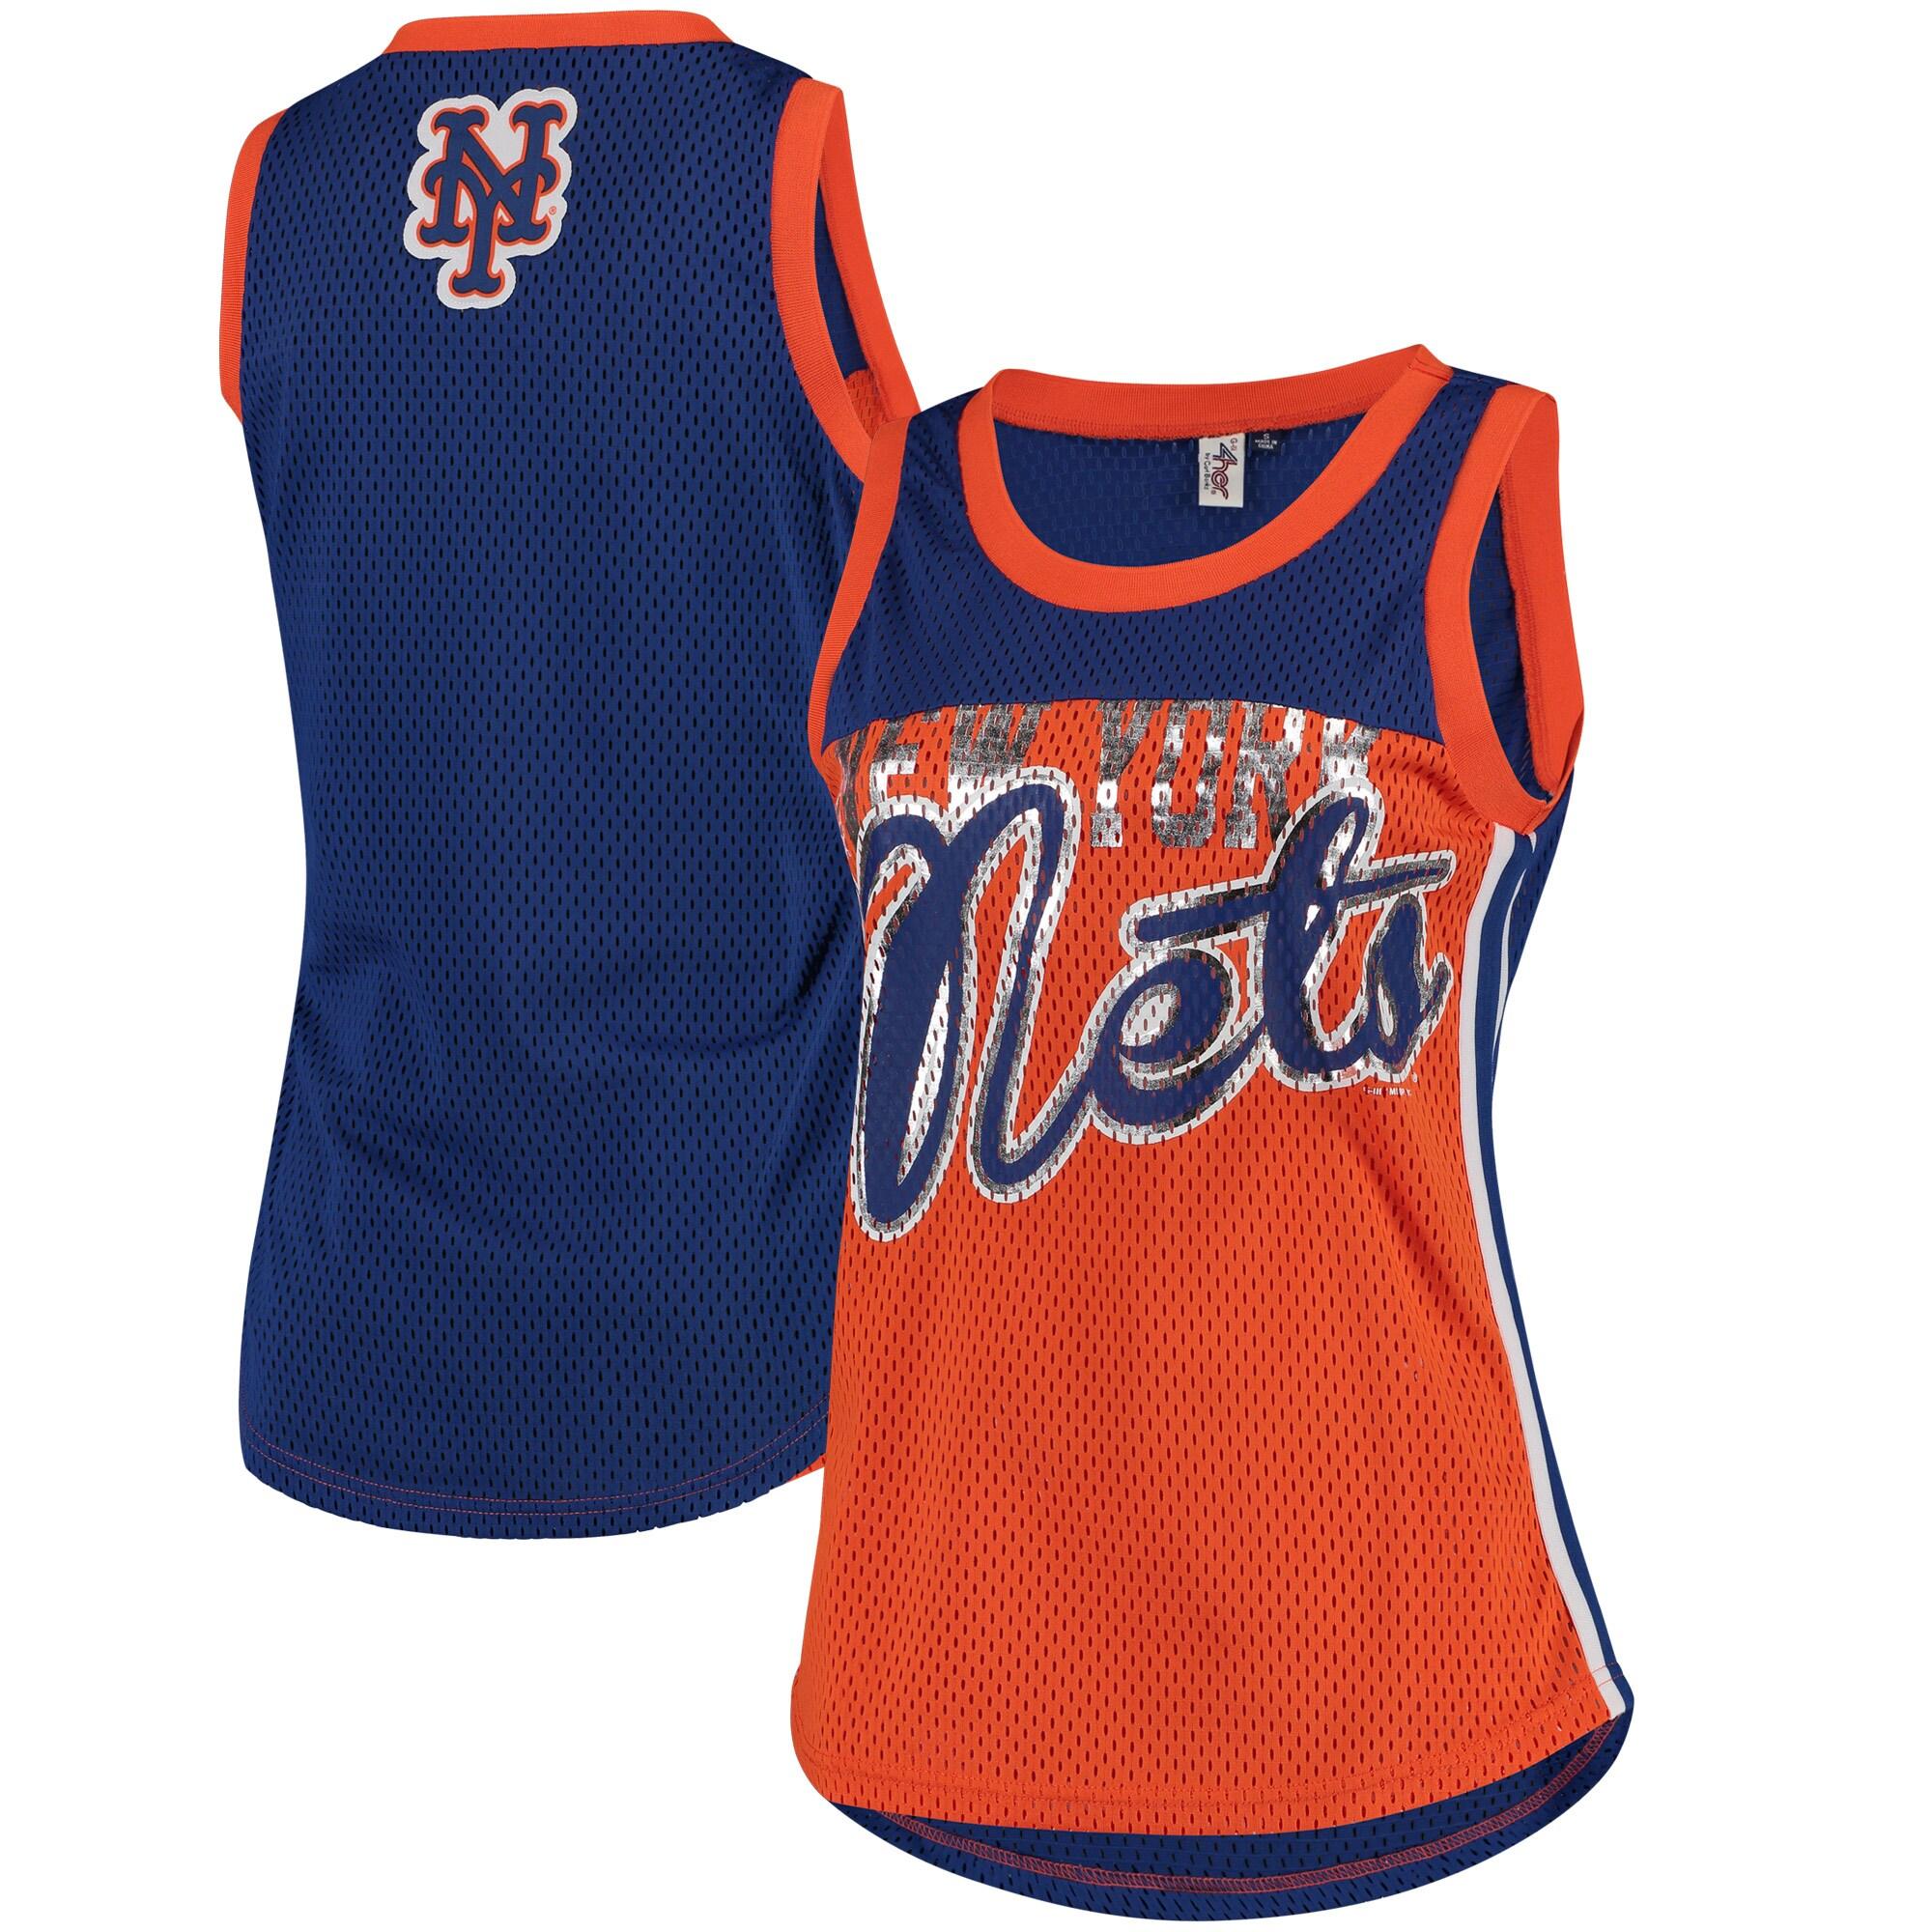 New York Mets G-III 4Her by Carl Banks Women's Championship Tank Top - Orange/Navy